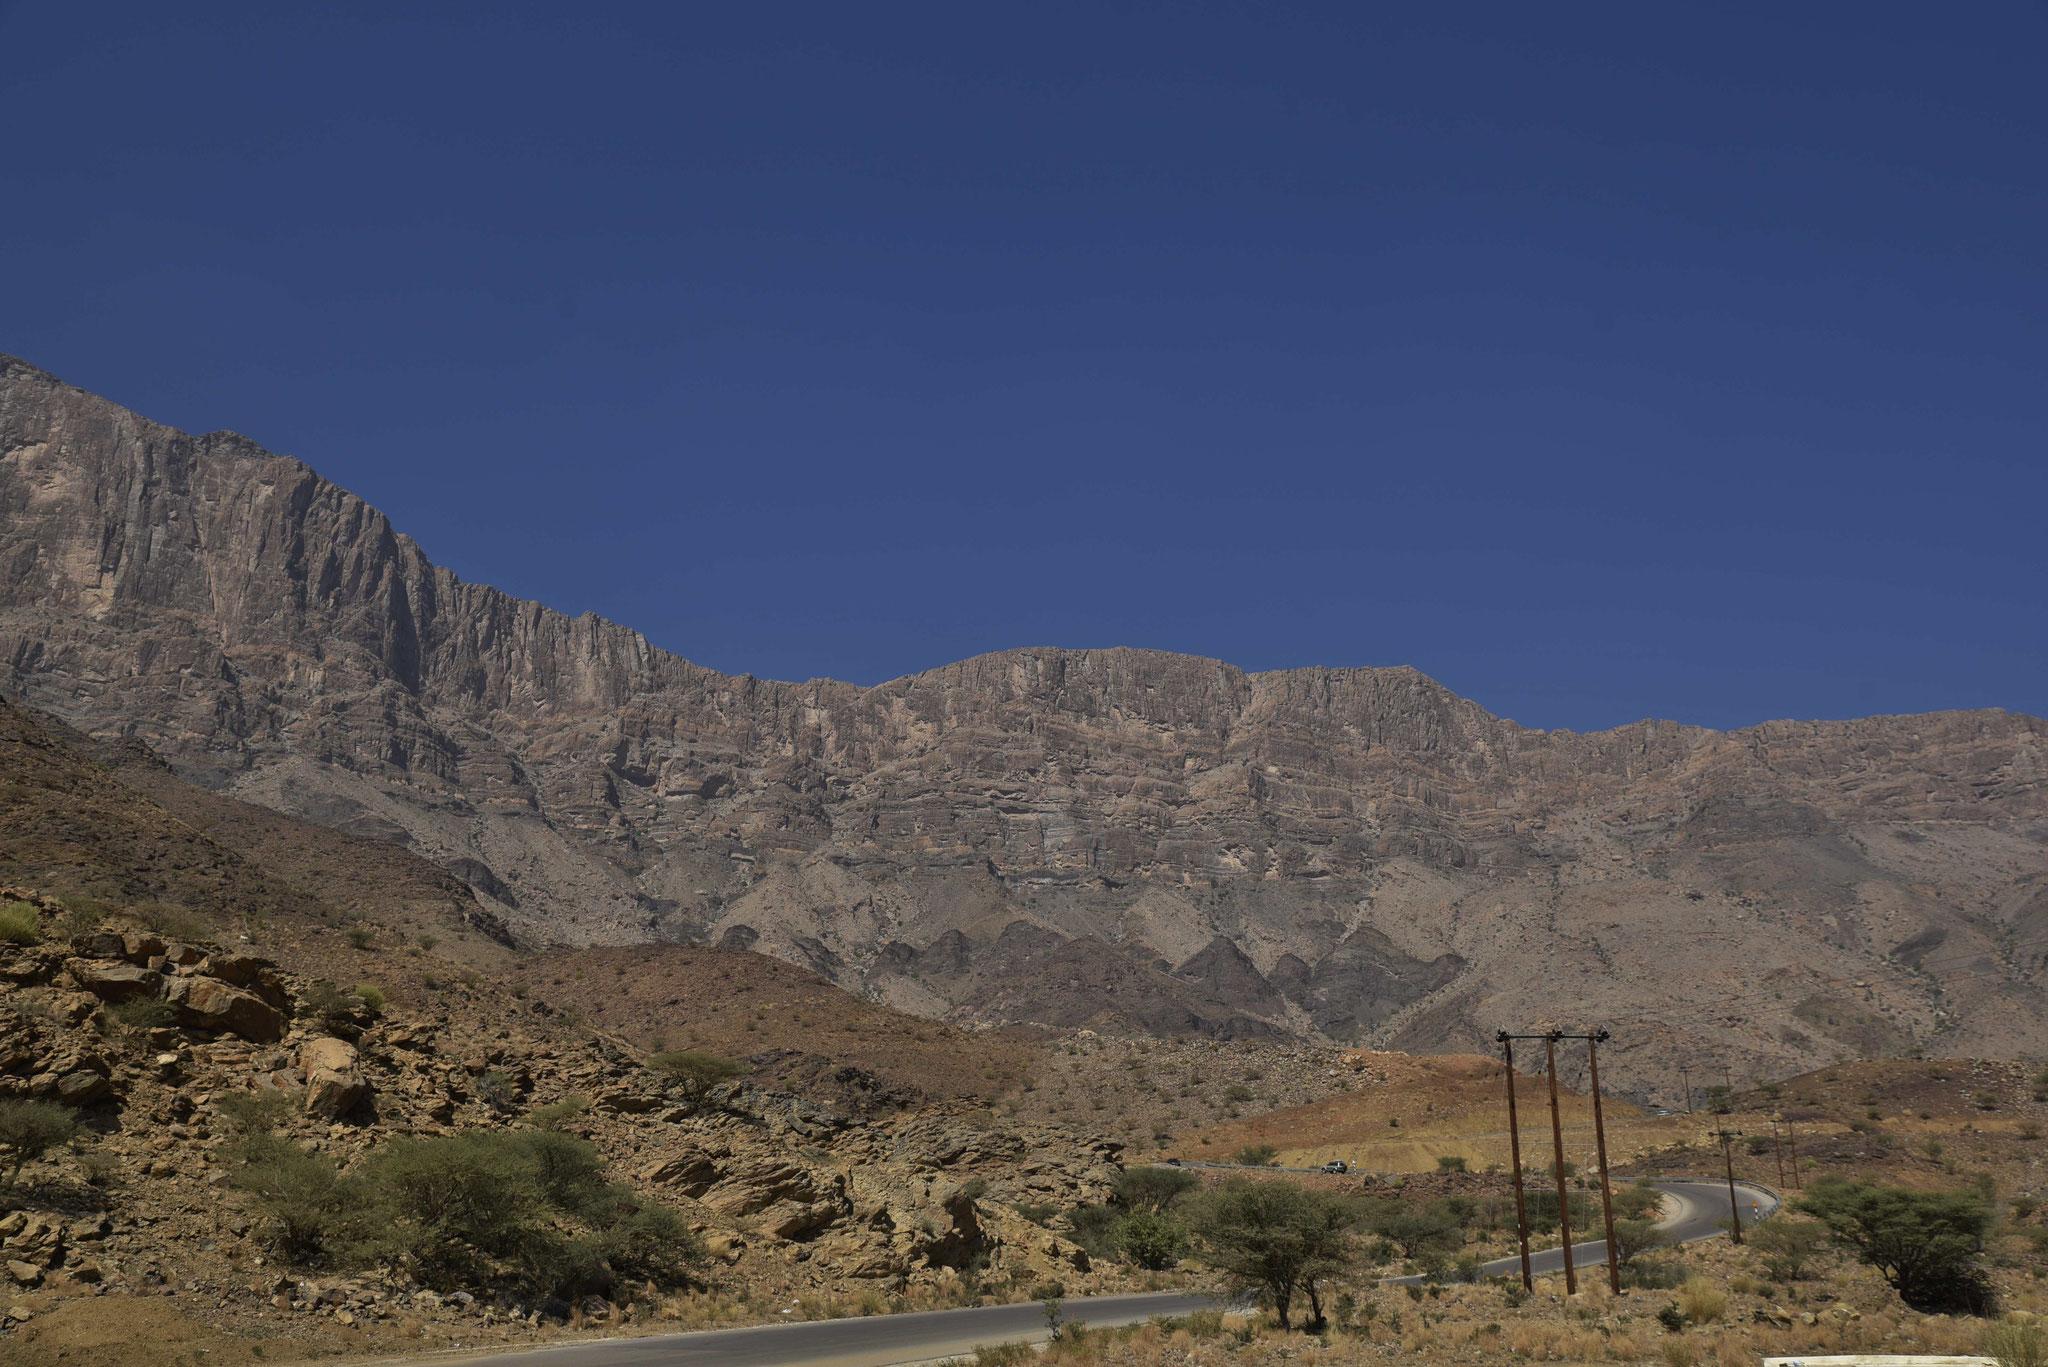 Auf dem Weg zum Jebel Shams VI